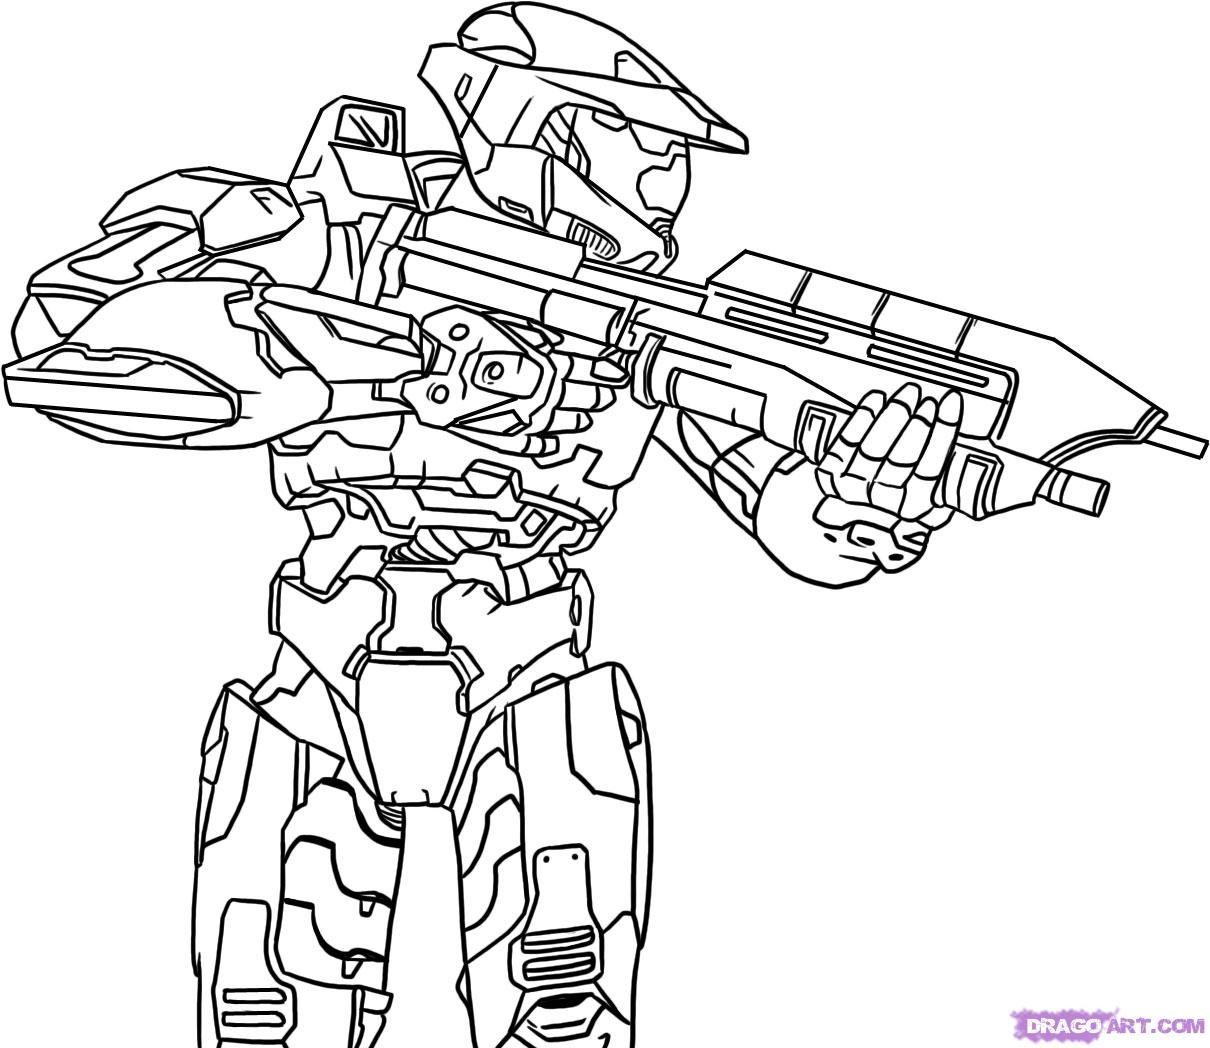 Halo 5 Dibujos Para Pintar - Dibujos Para Pintar